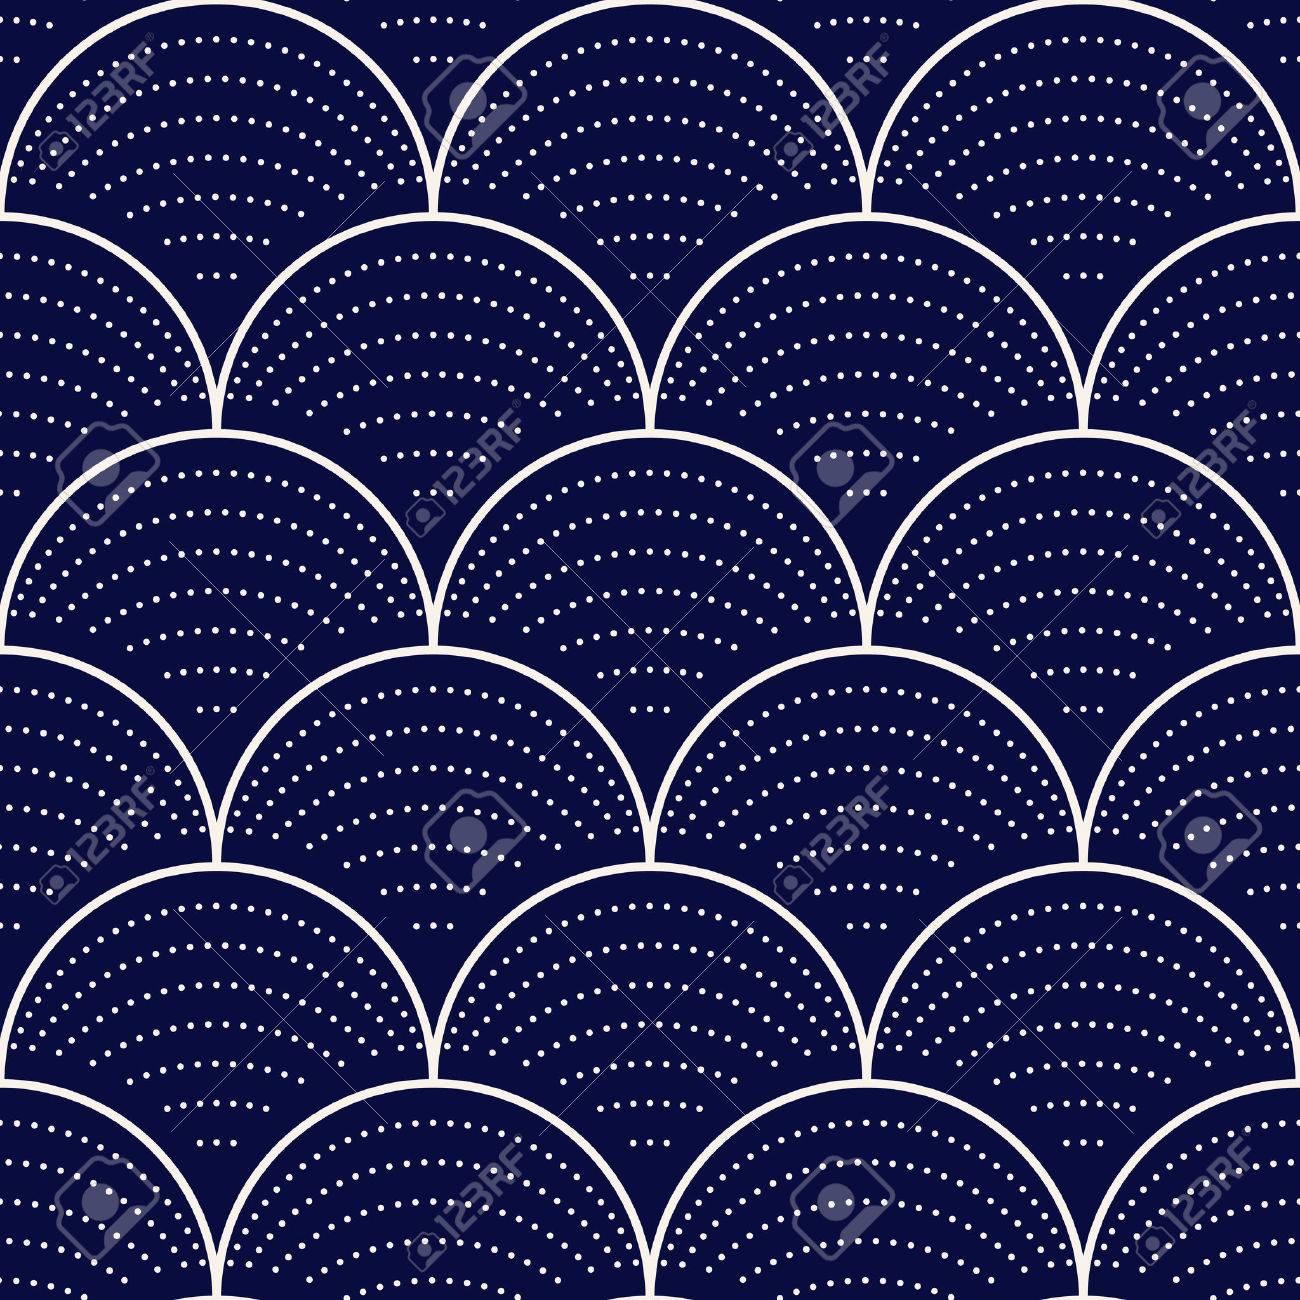 Japanese wave seamless pattern, vector illustration - 55752518